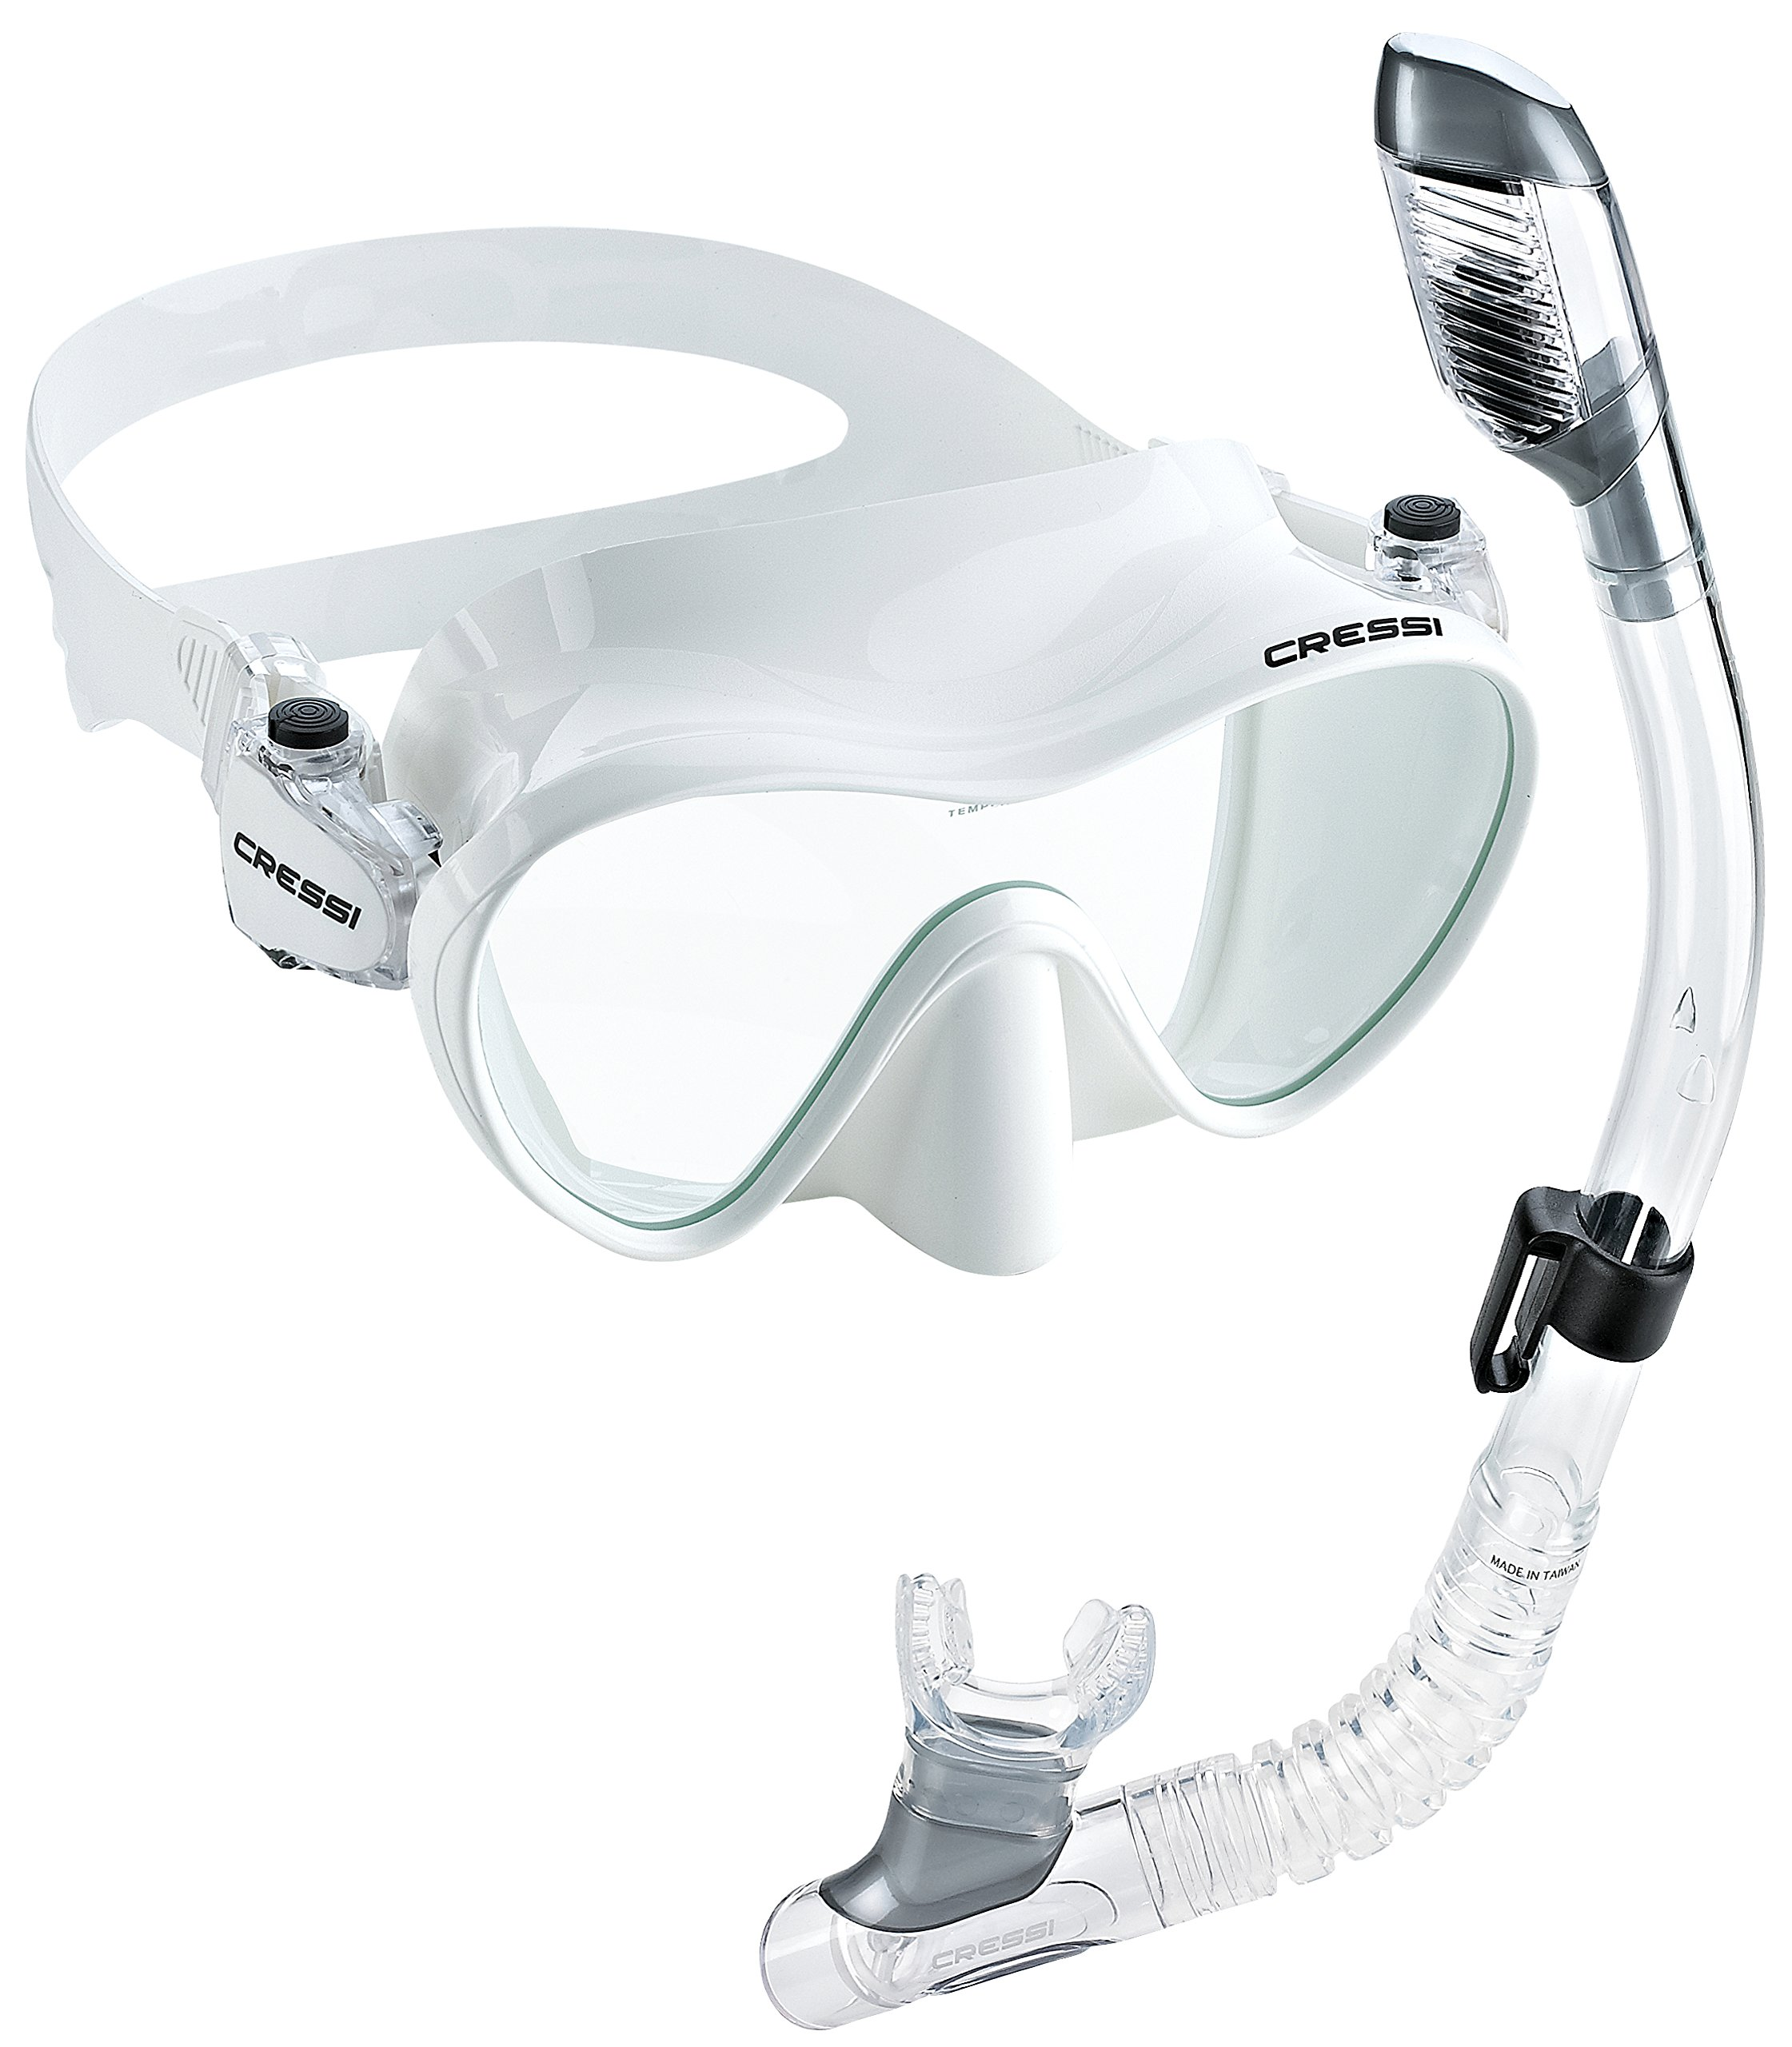 Cressi Junior Frameless Mask Dry Snorkel Set, White by Cressi